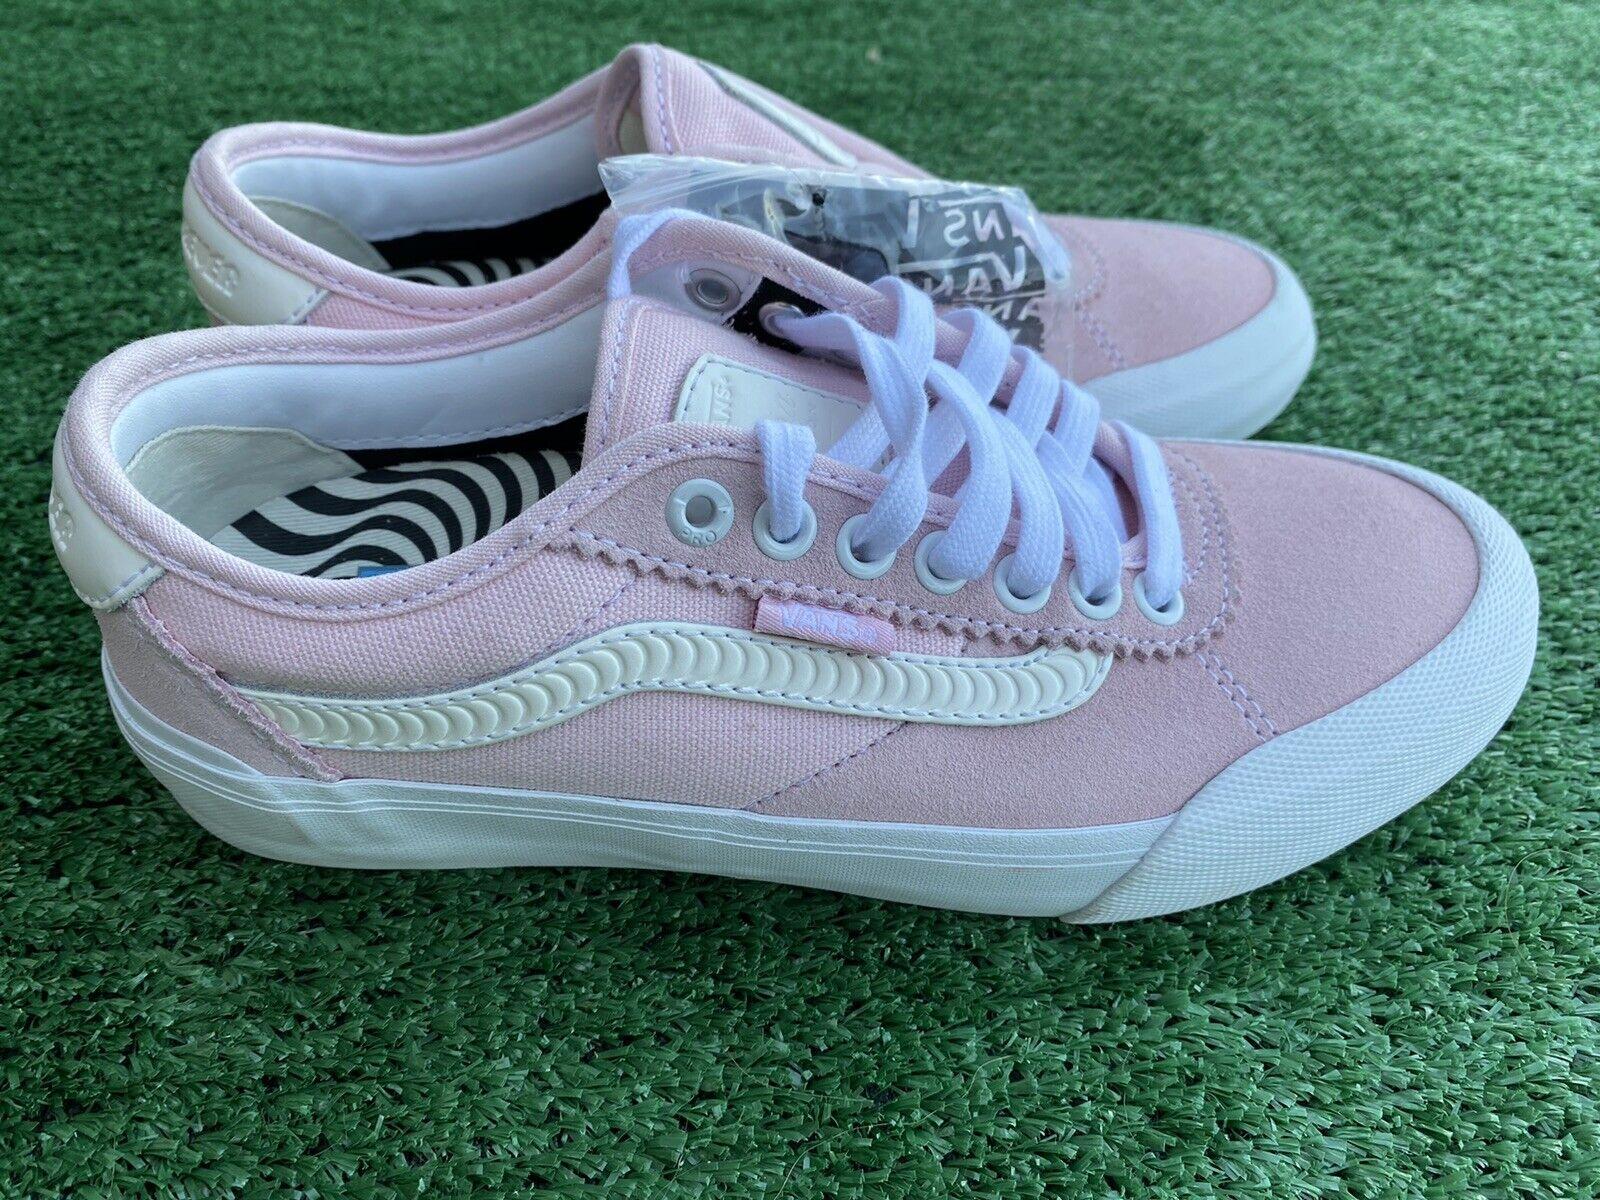 VANS Chima Pro 2 Spitfire Pink UK Size